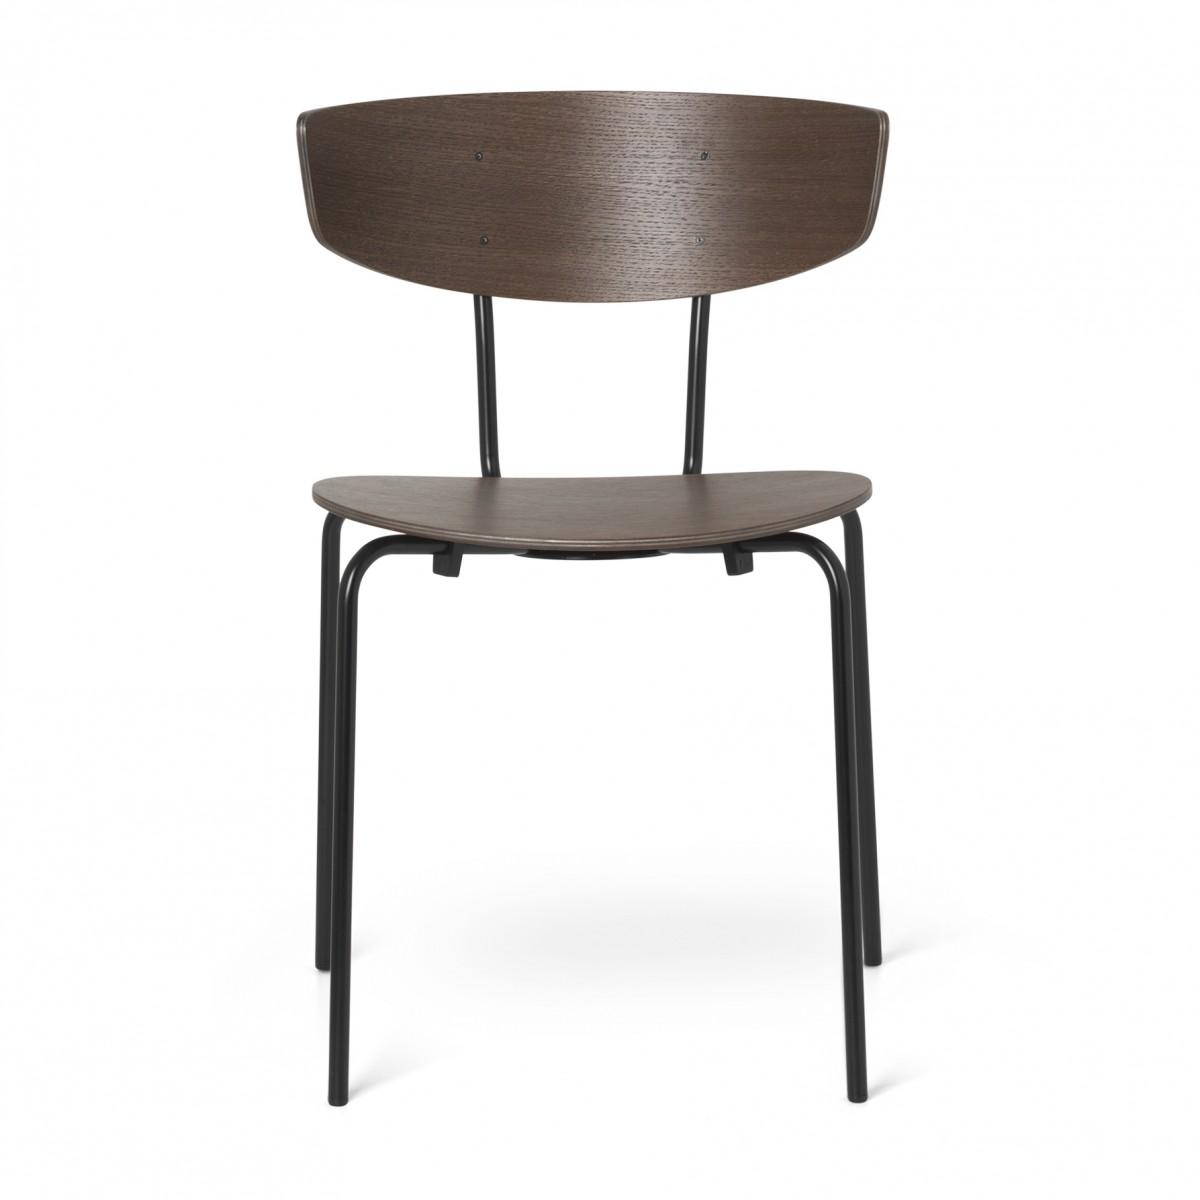 HERMAN dark oak chair - Ferm Living at COLONEL shop